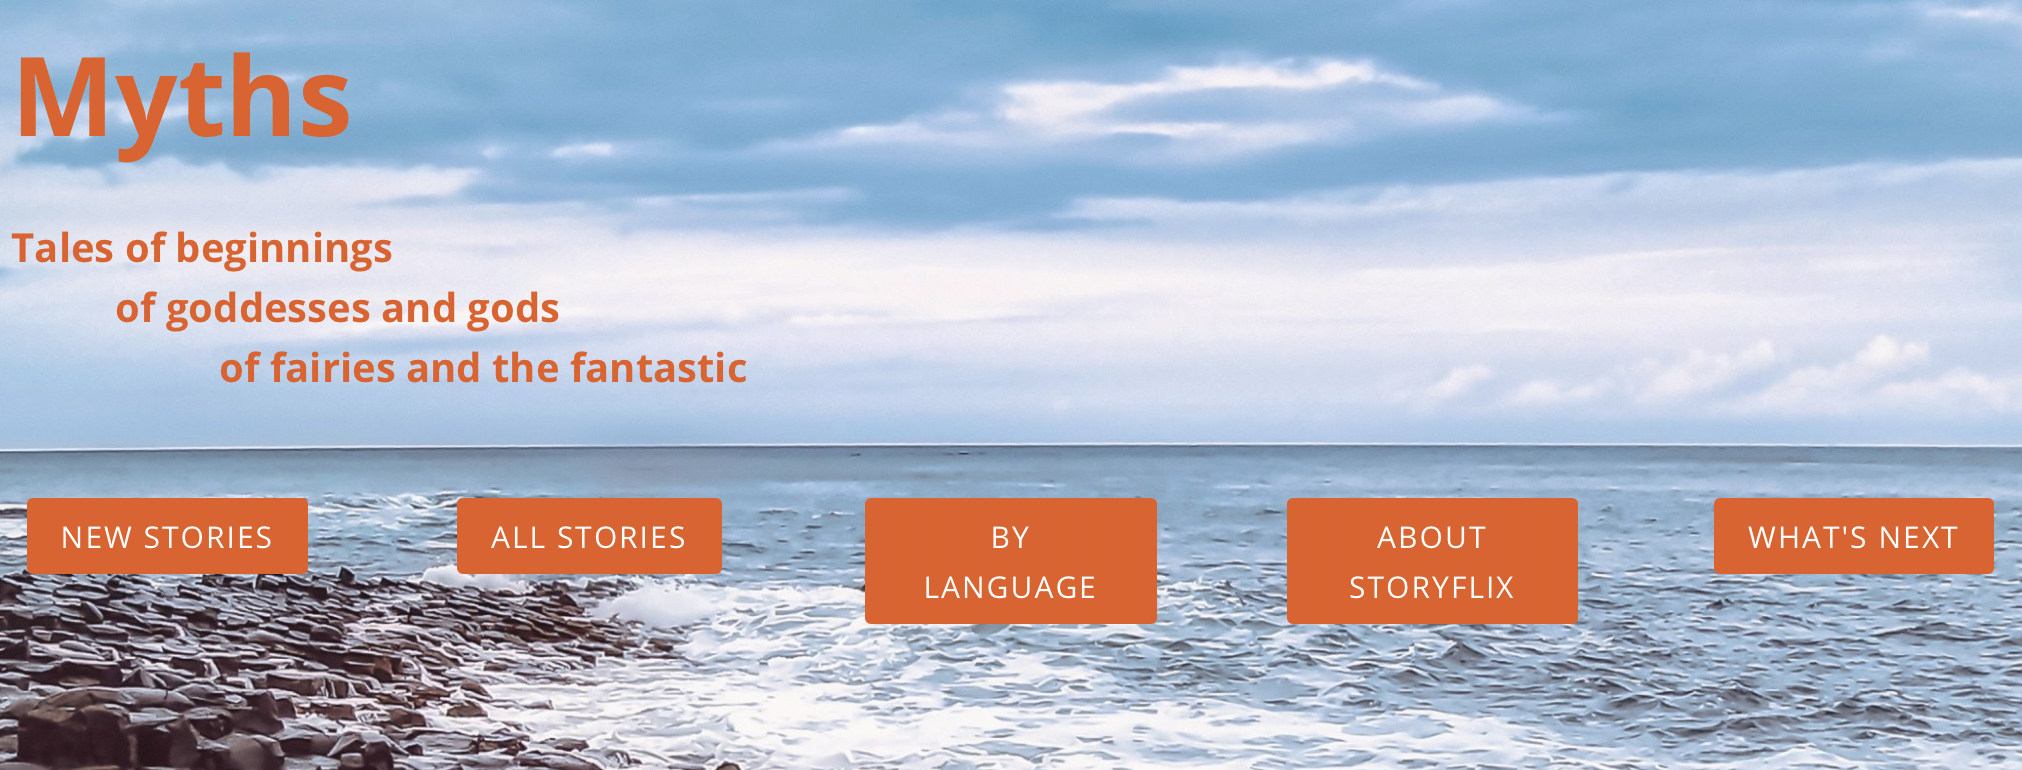 Myths homepage